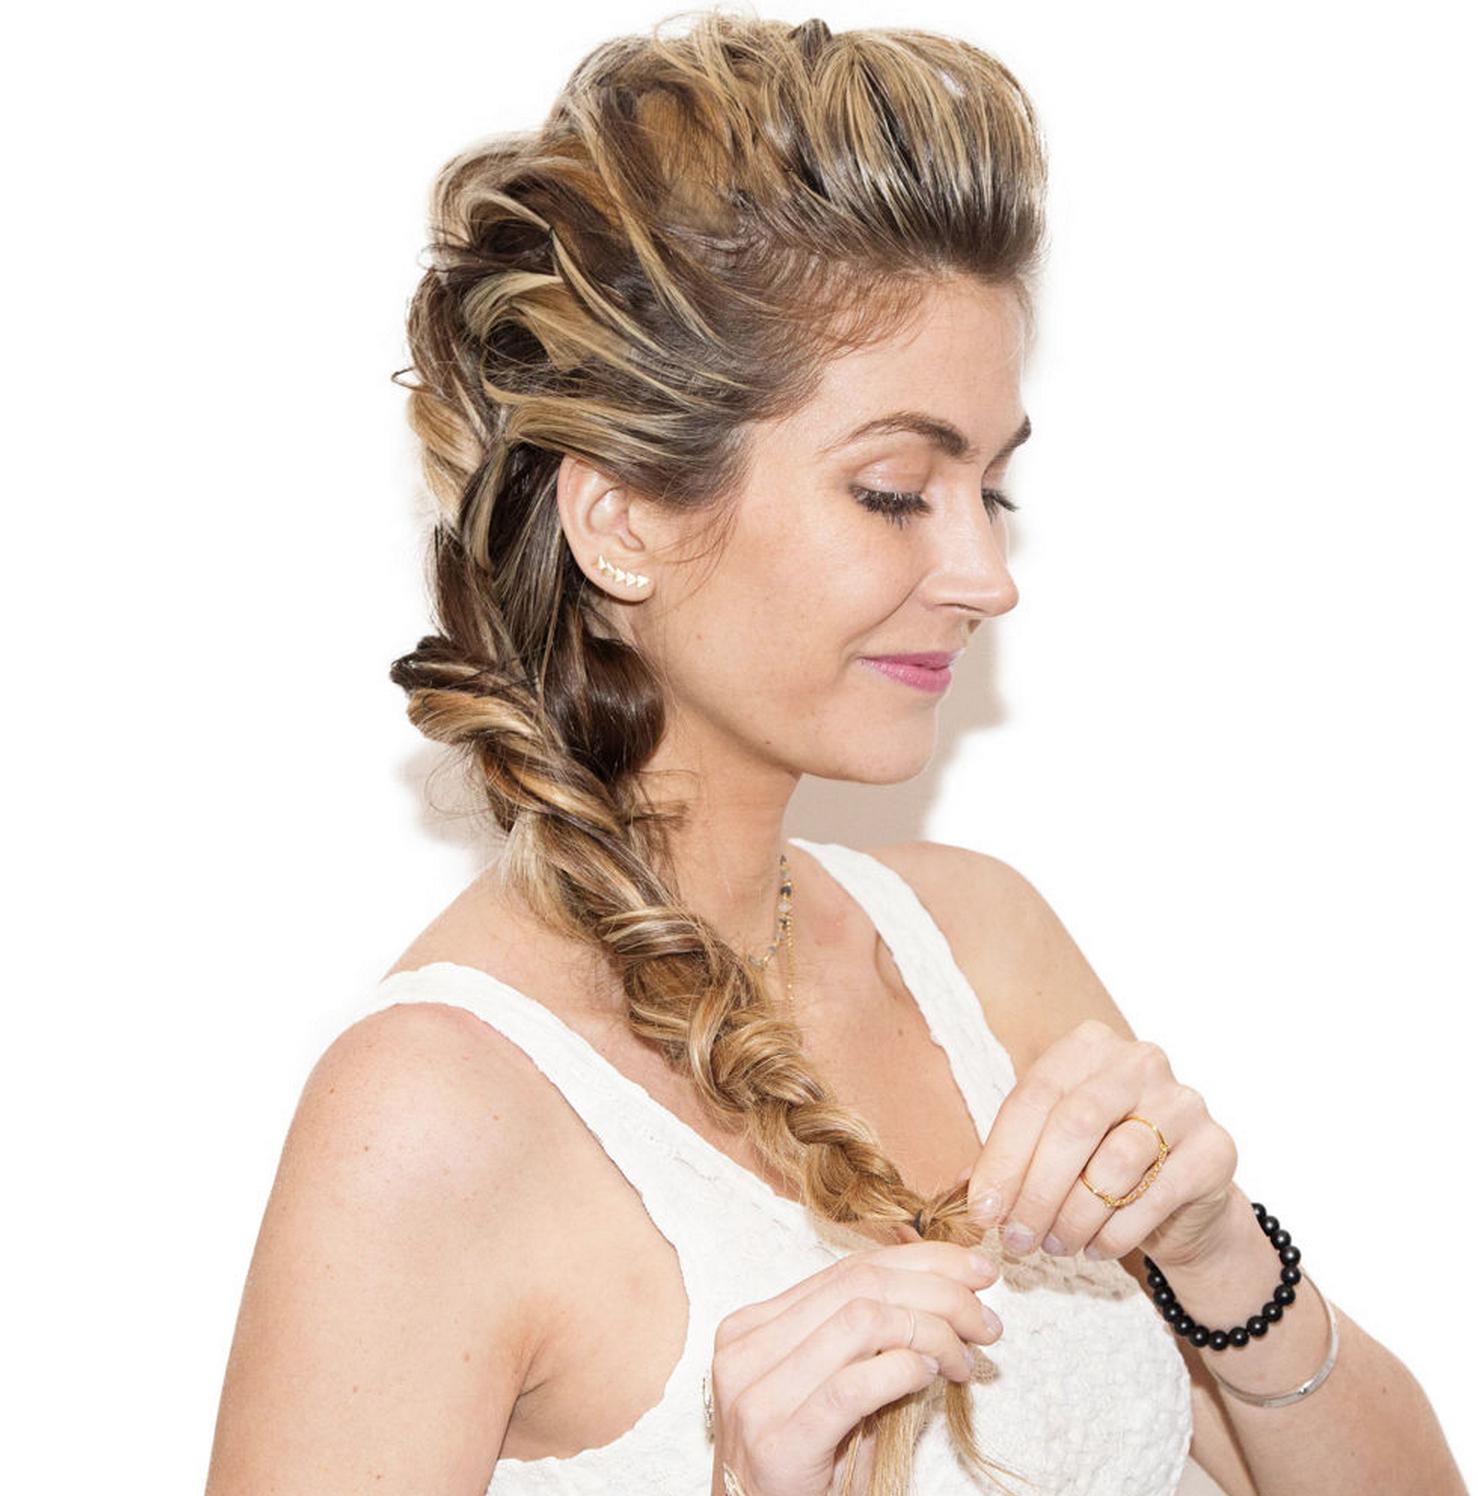 2019 Braids And Bouffant Hairstyles Regarding How To: Khaleesi Braid (View 6 of 20)